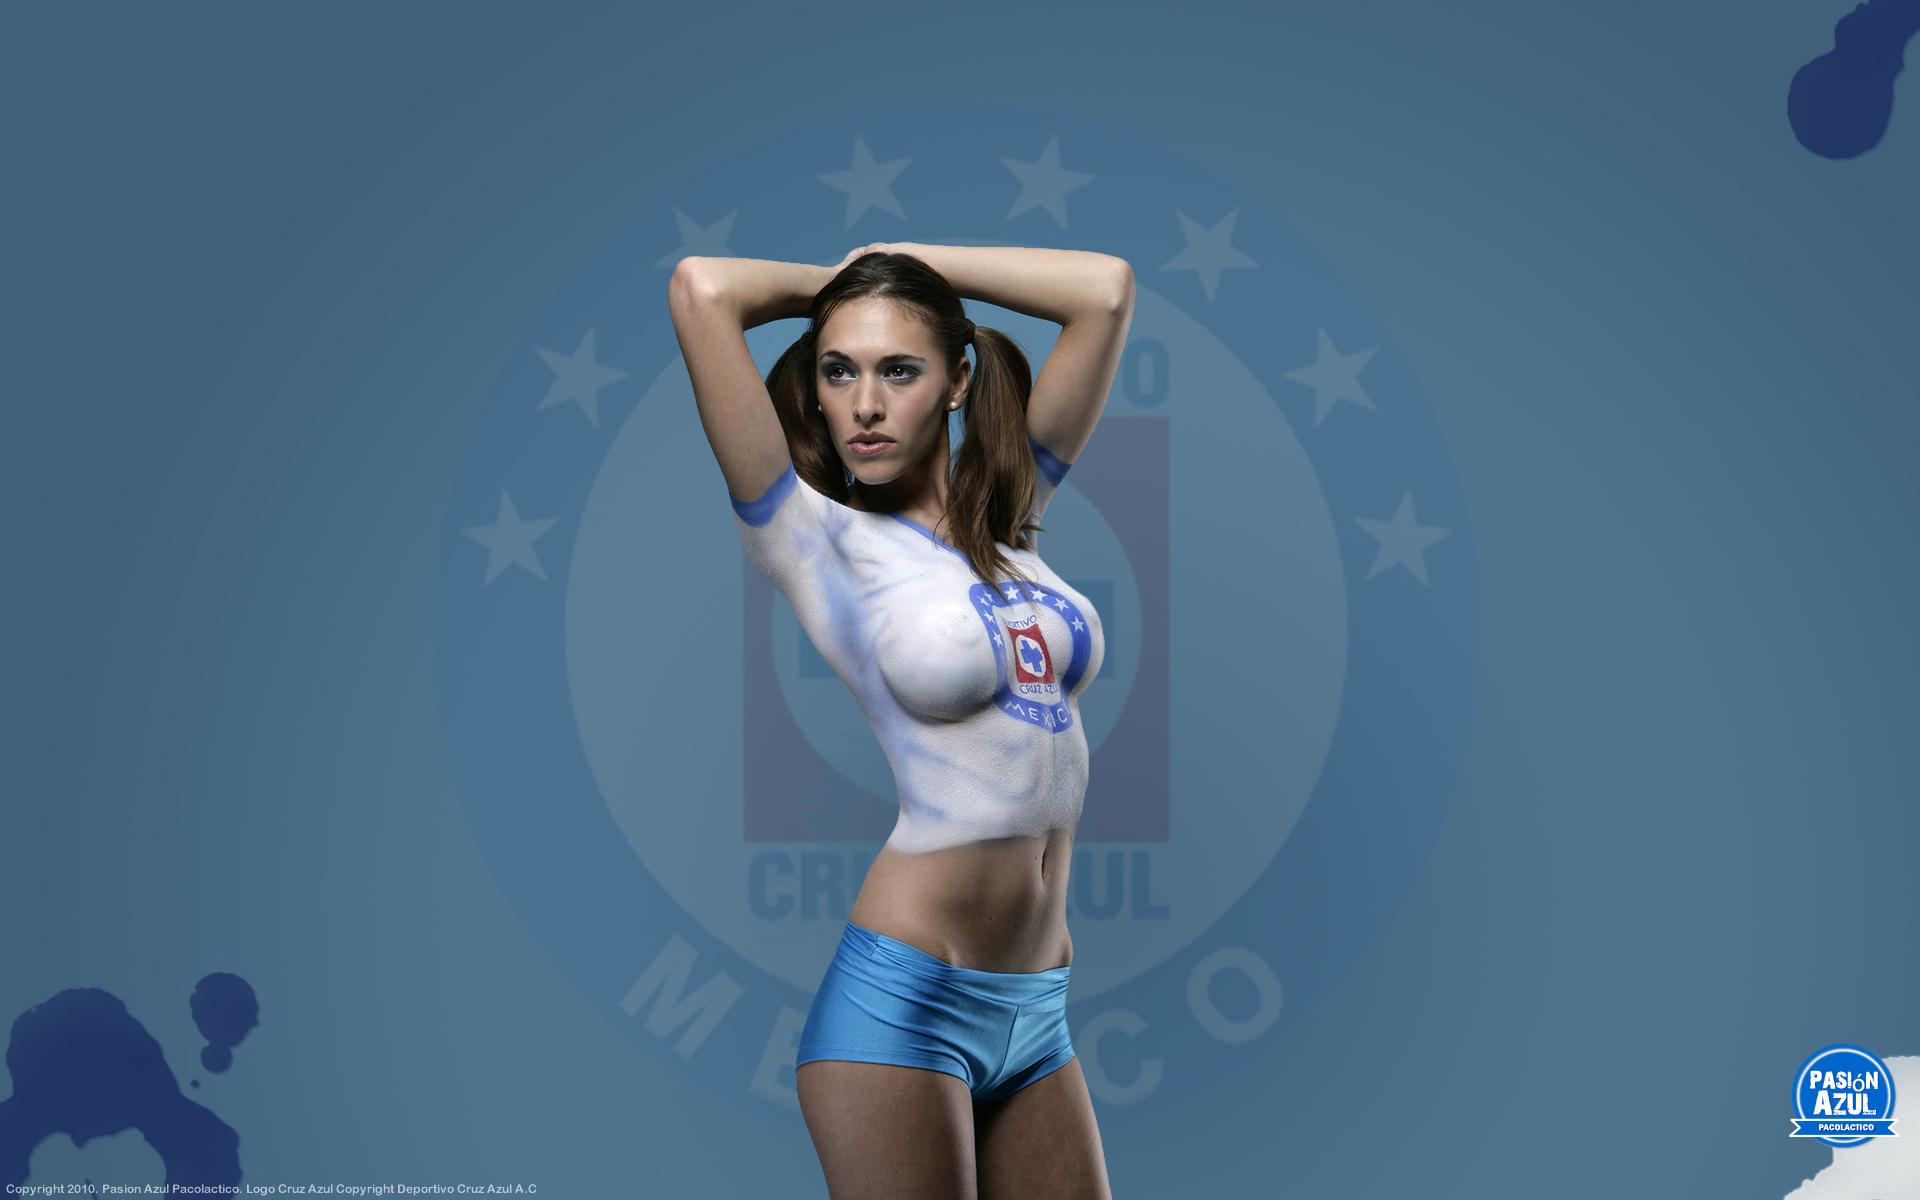 Fédération Internationale de Football Association (FIFA